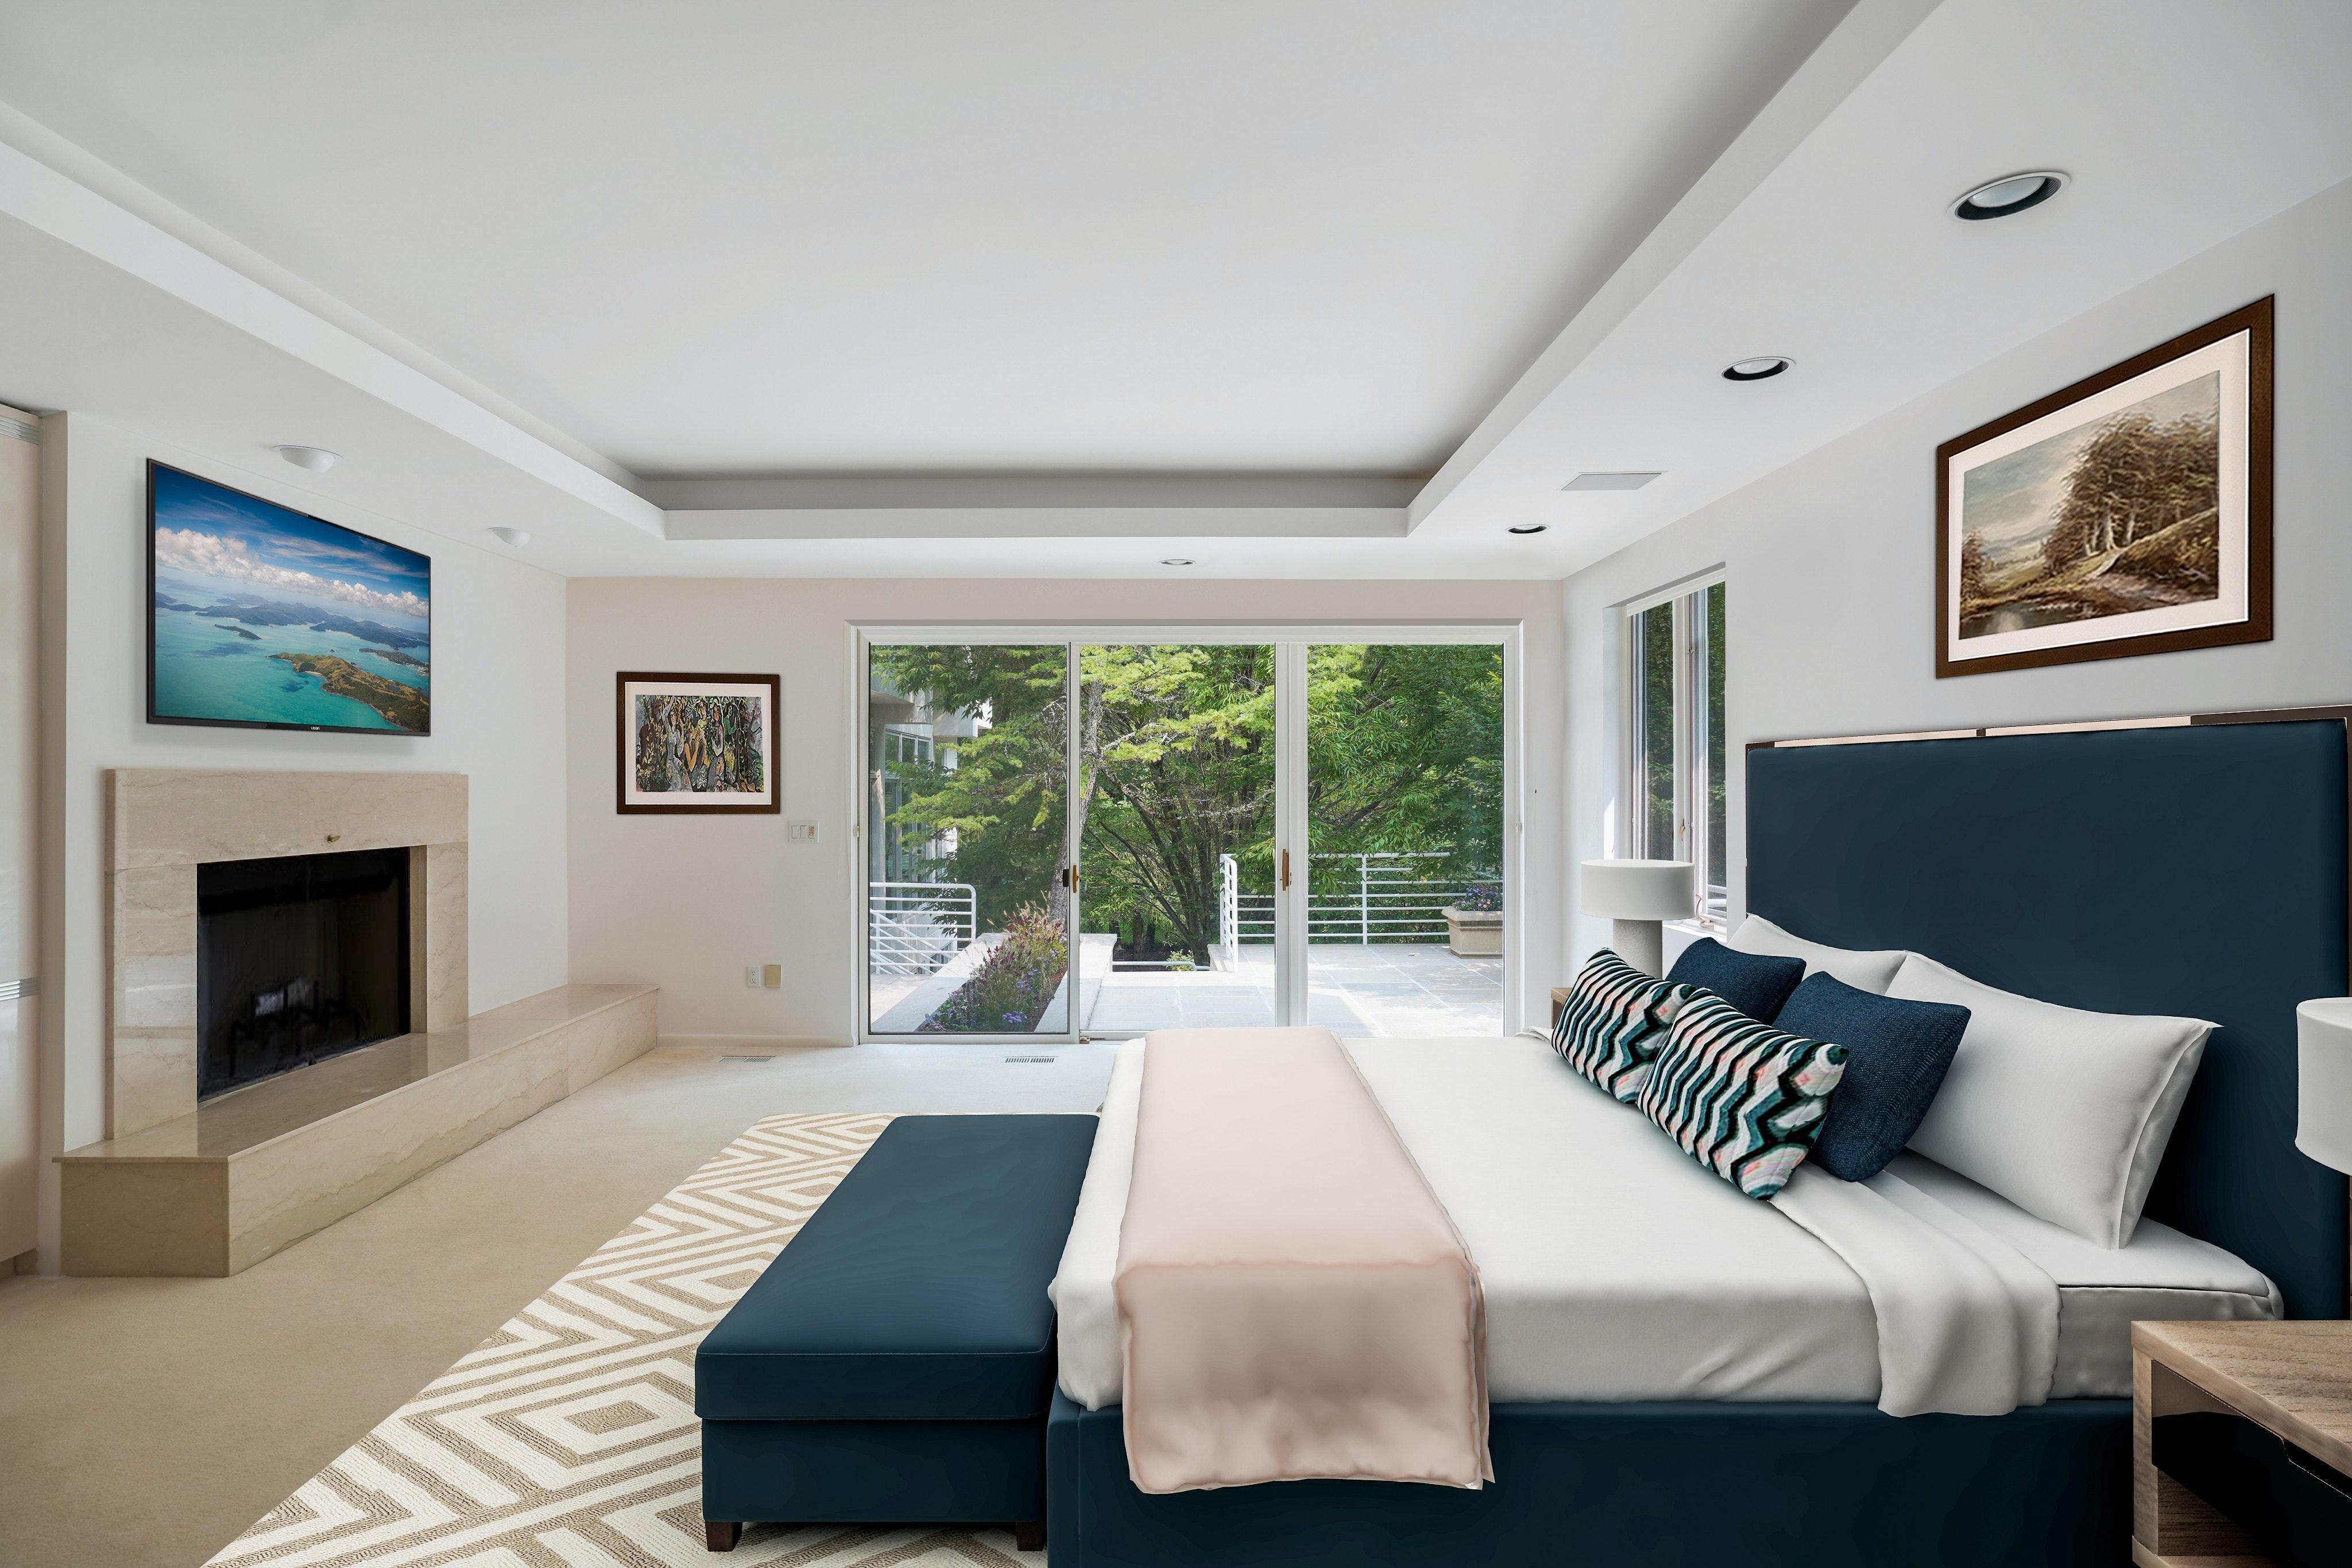 261 Hartshorn Drive Master Bedroom